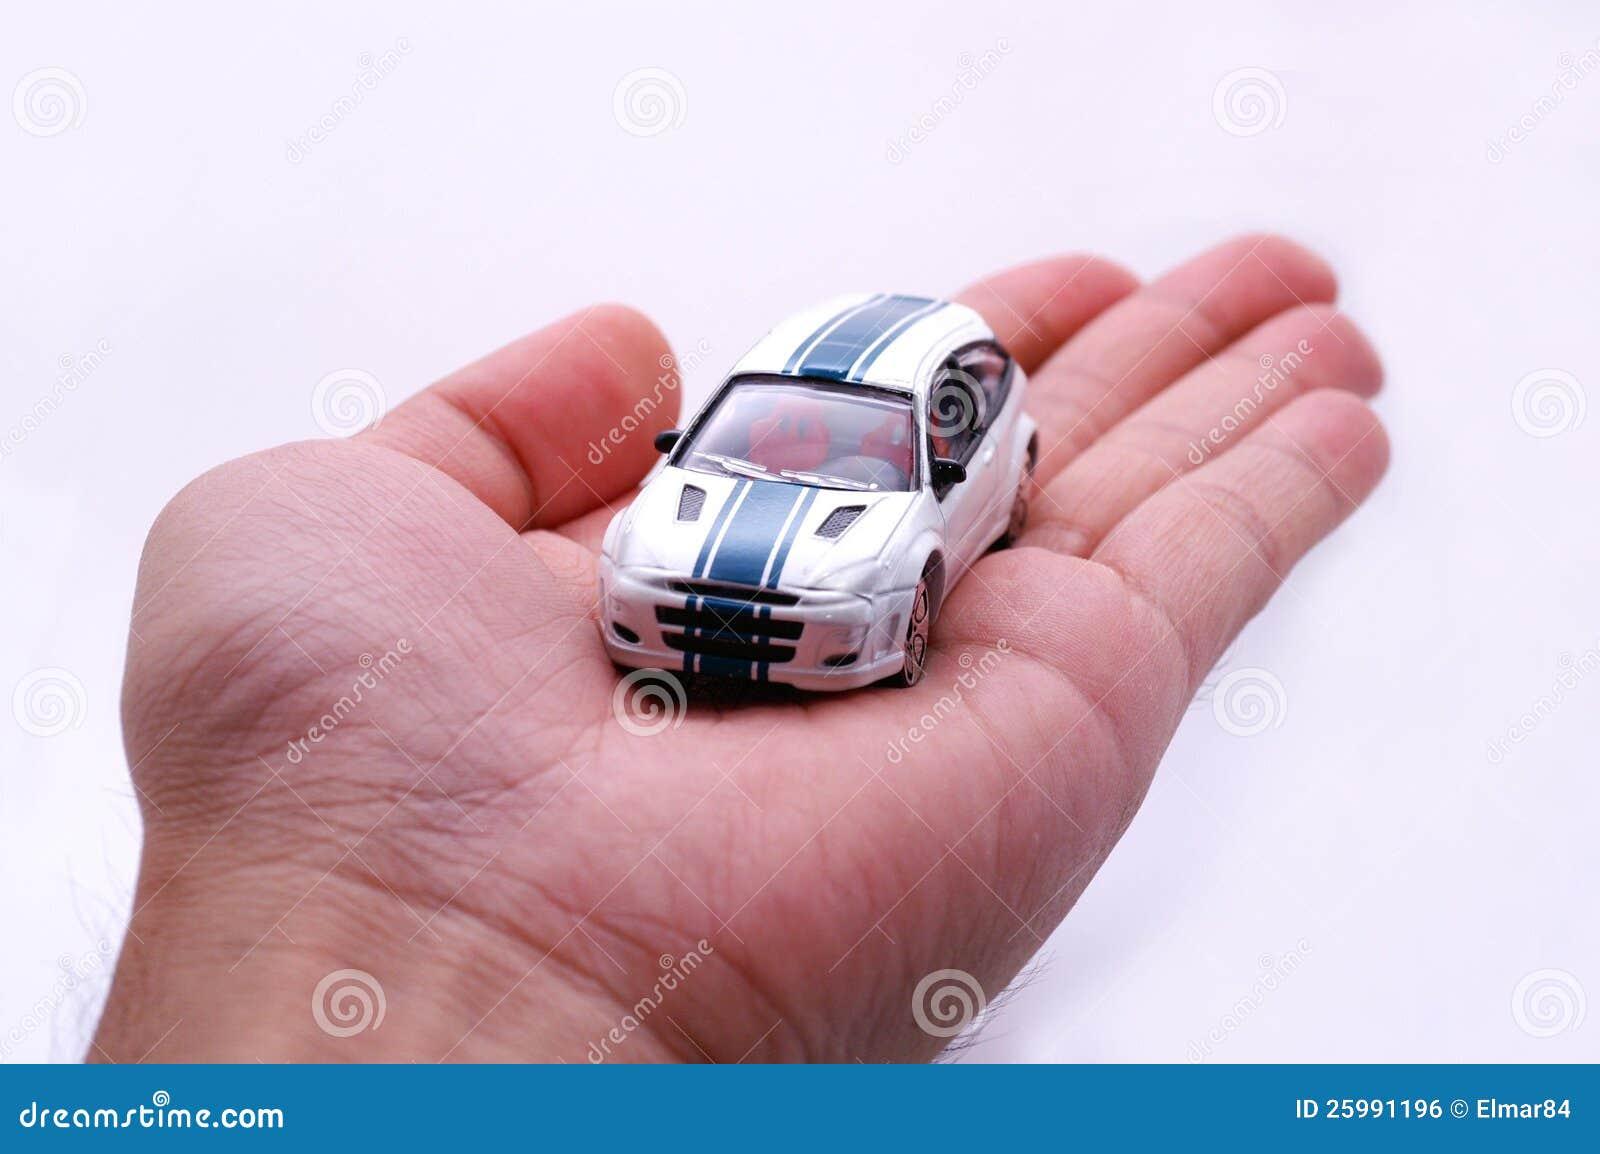 dream car royalty free stock image